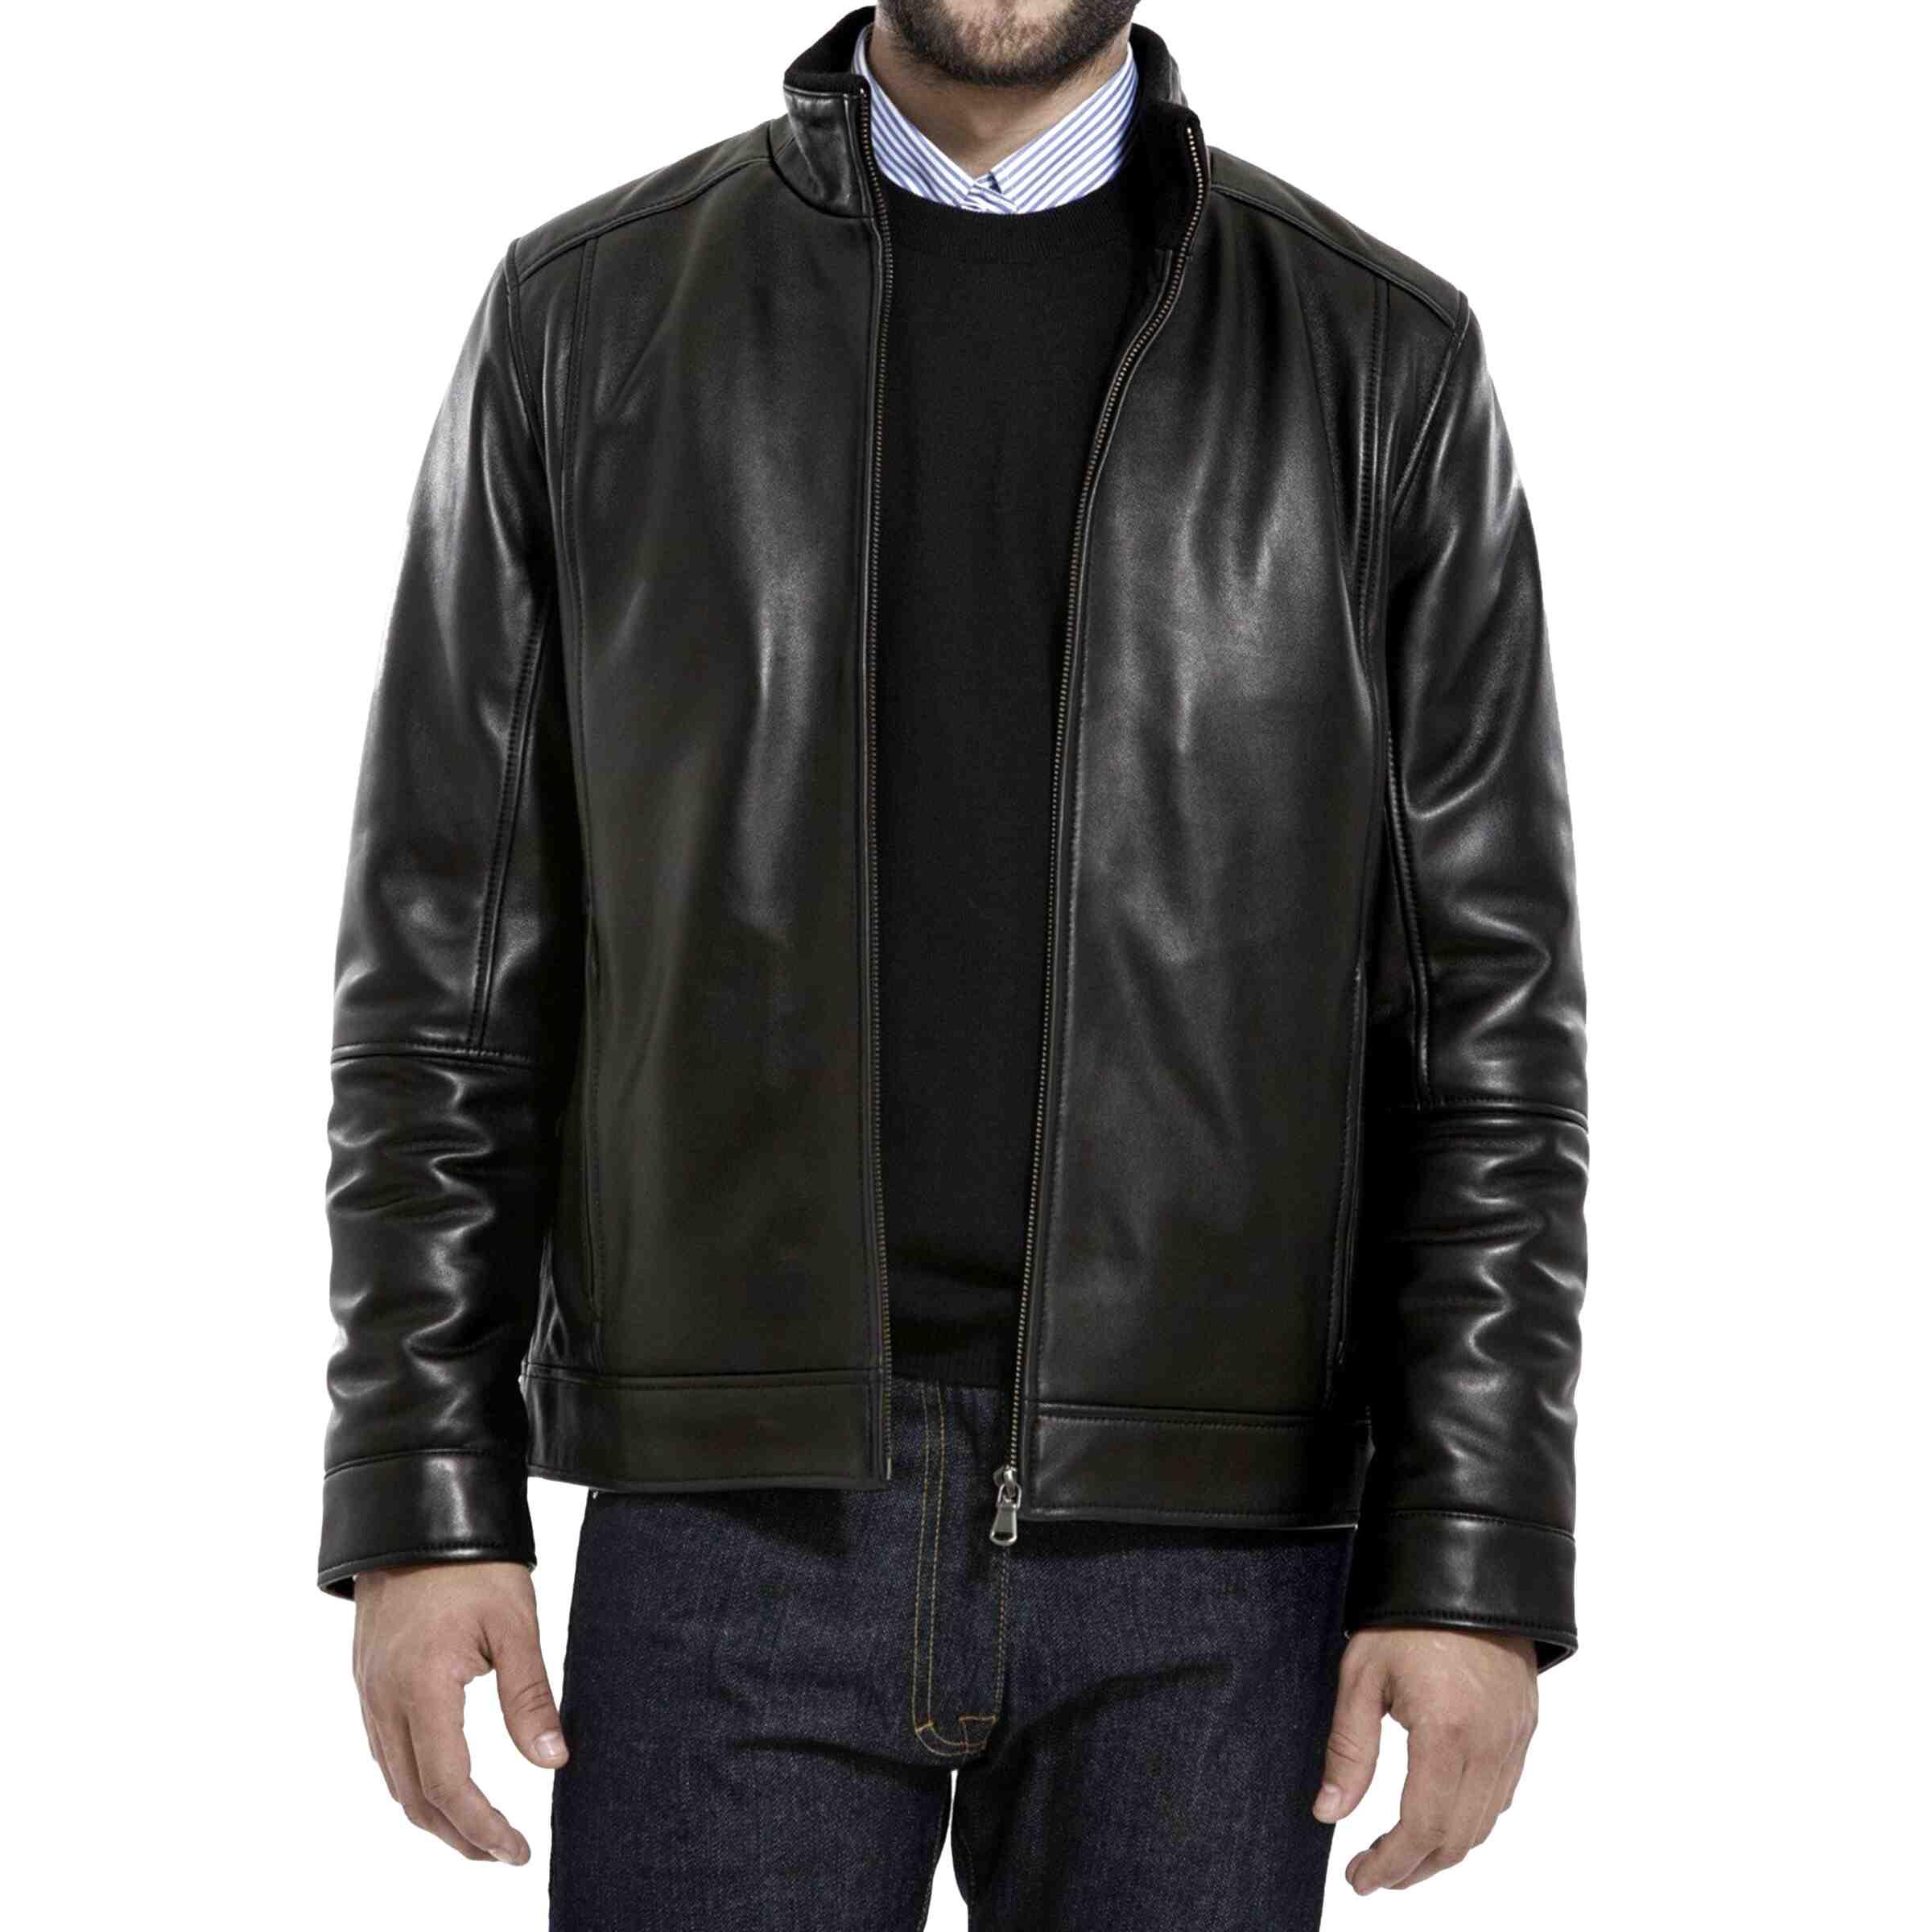 lambskin leather jacket for sale